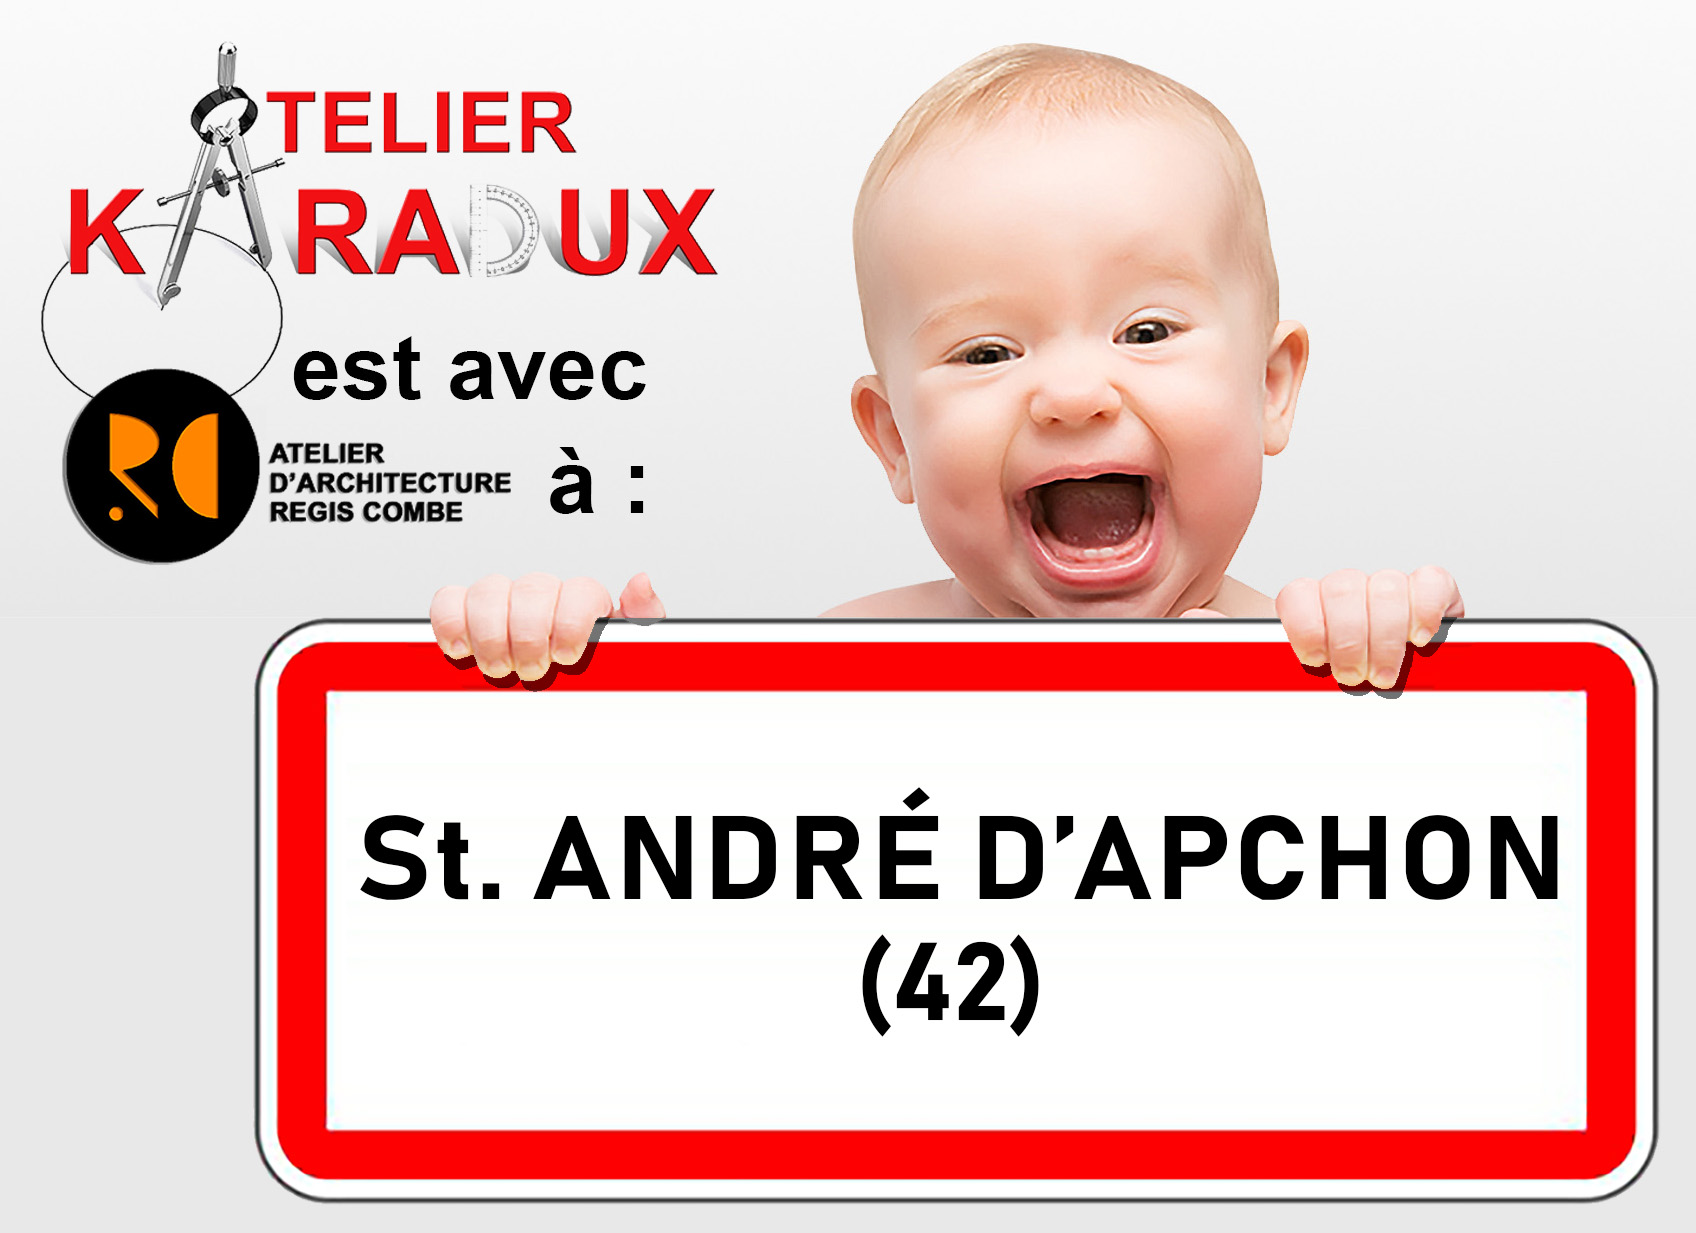 St ANDRE D'APCHON